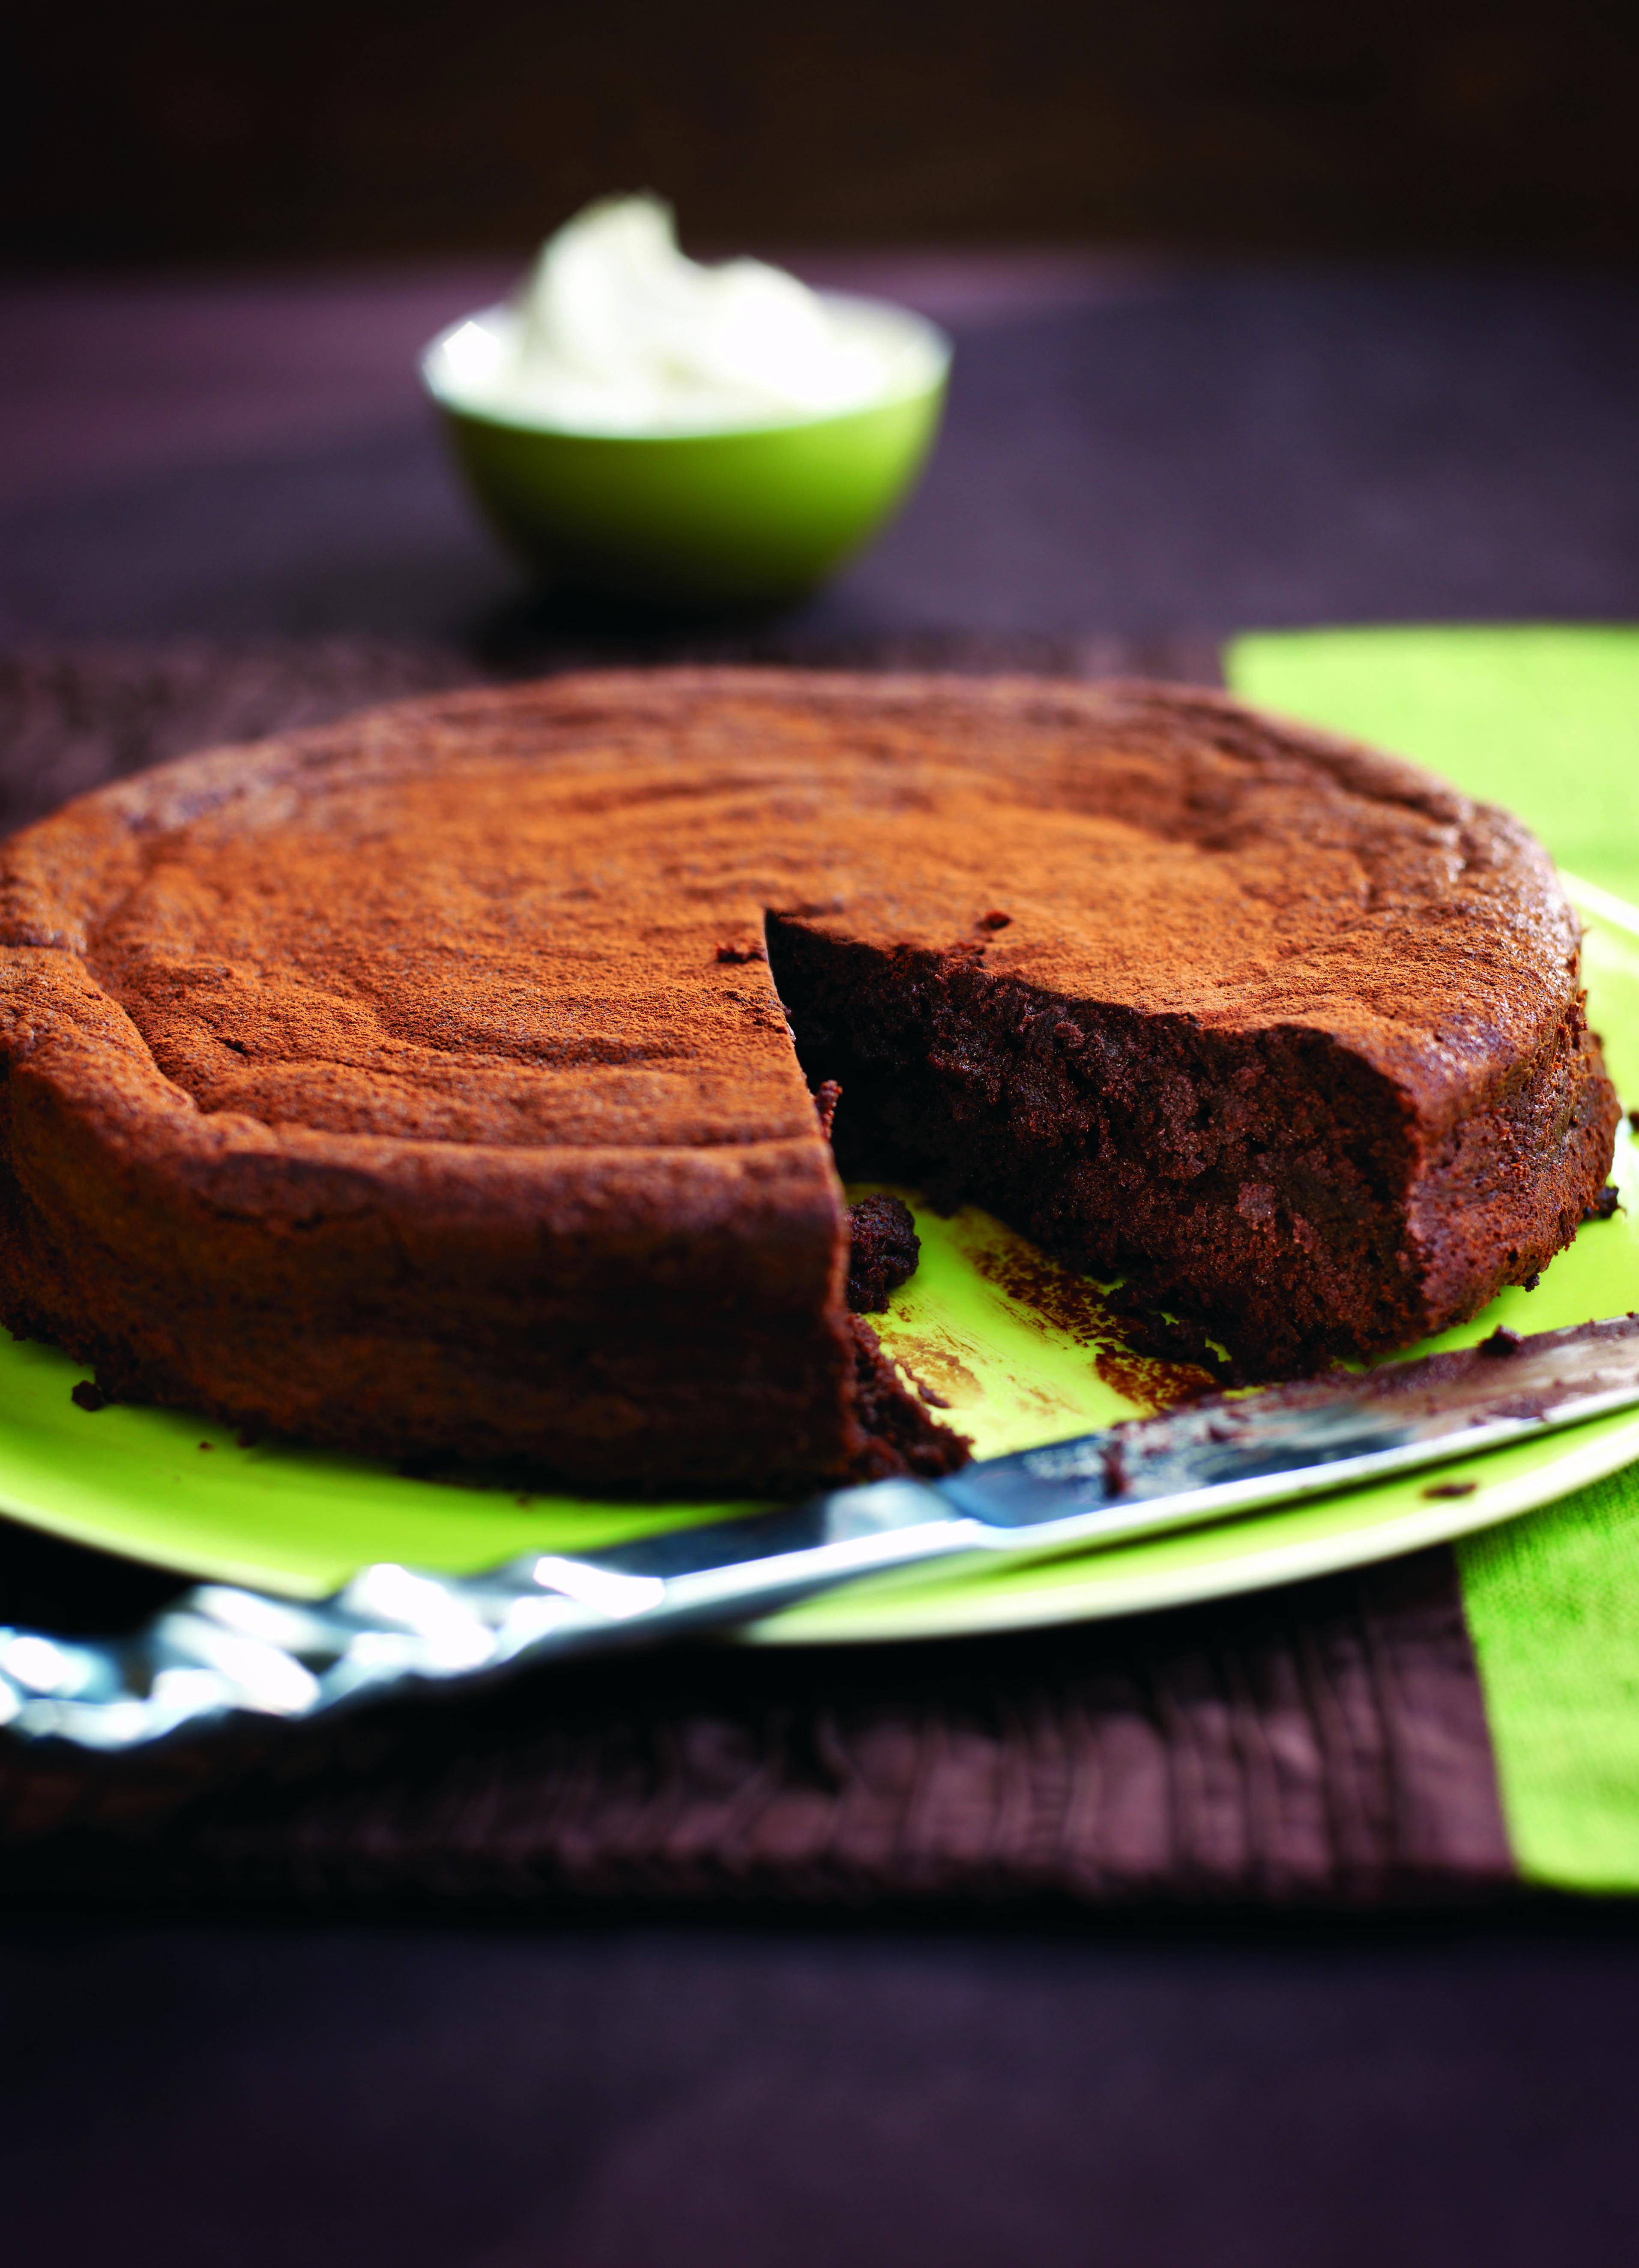 Chocolate Truffle Cake Recipe With Amaretto Cream